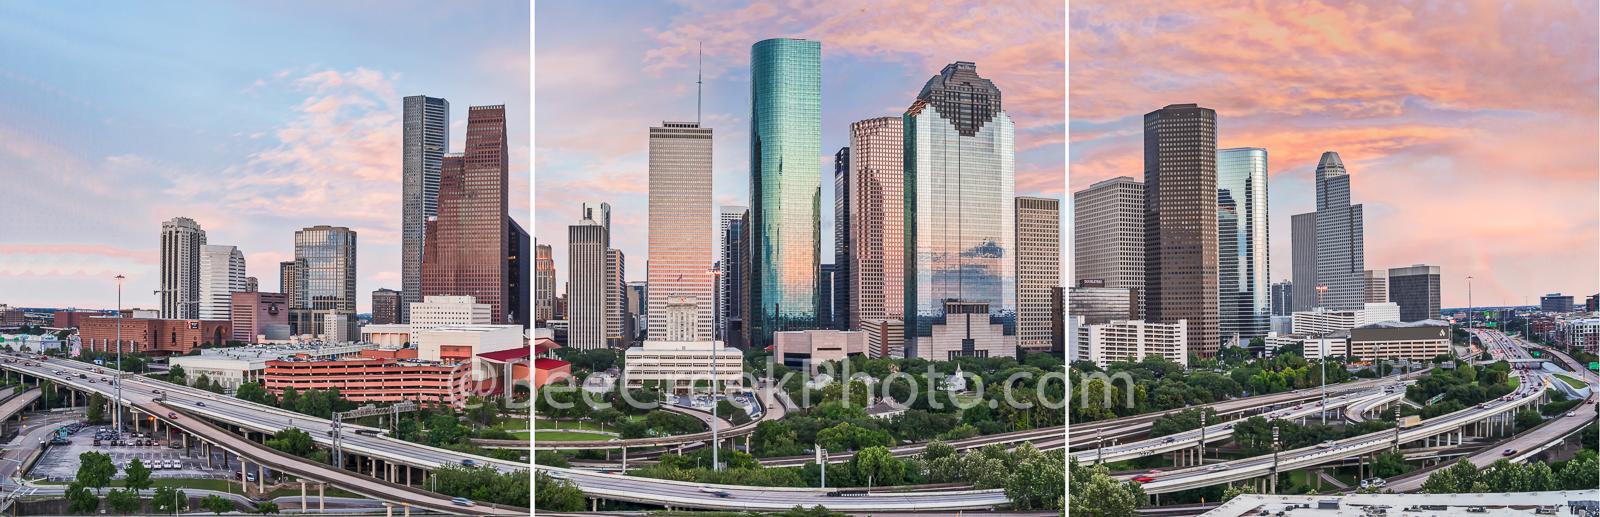 Houston, skyline, split panel images, triptych, mulitple images,